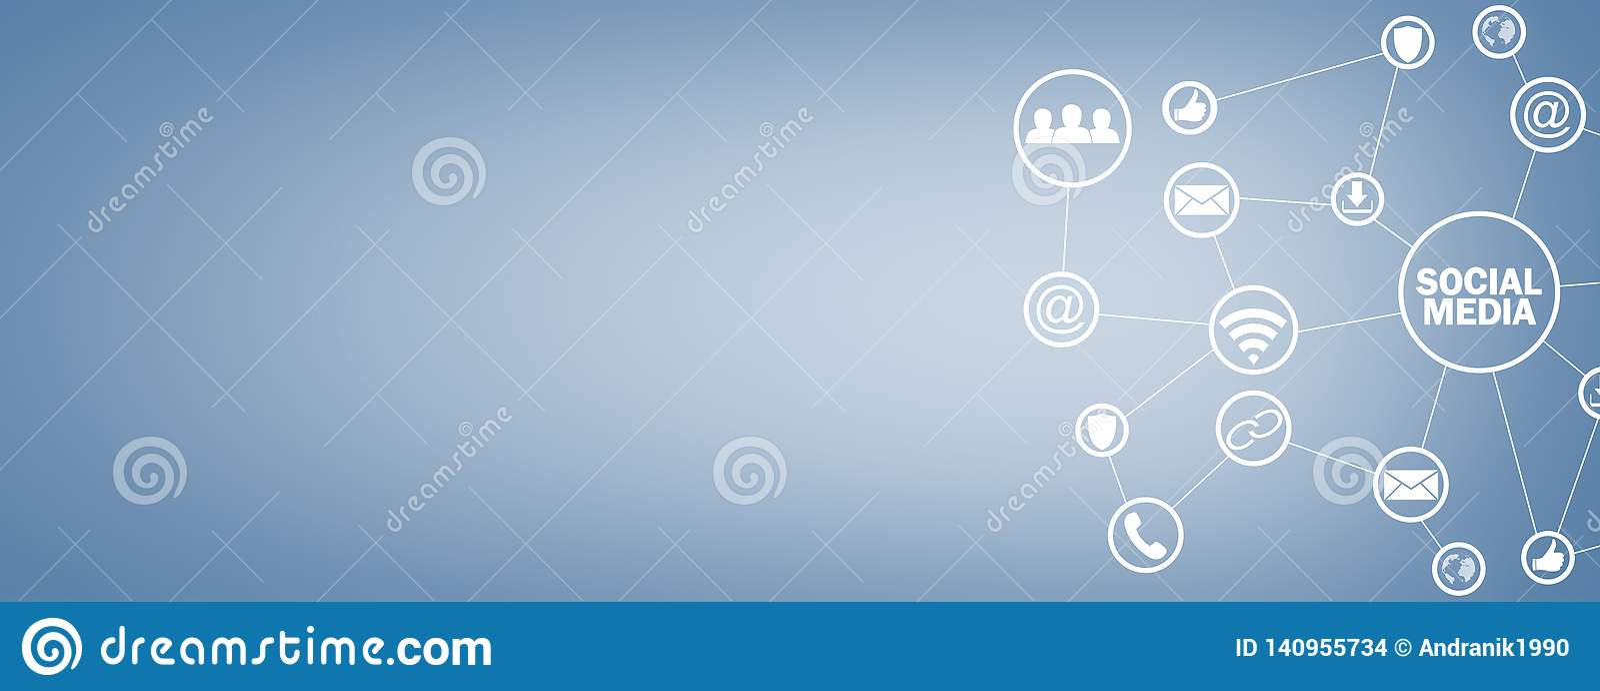 Social Media Concept. Business, Technology, Communication